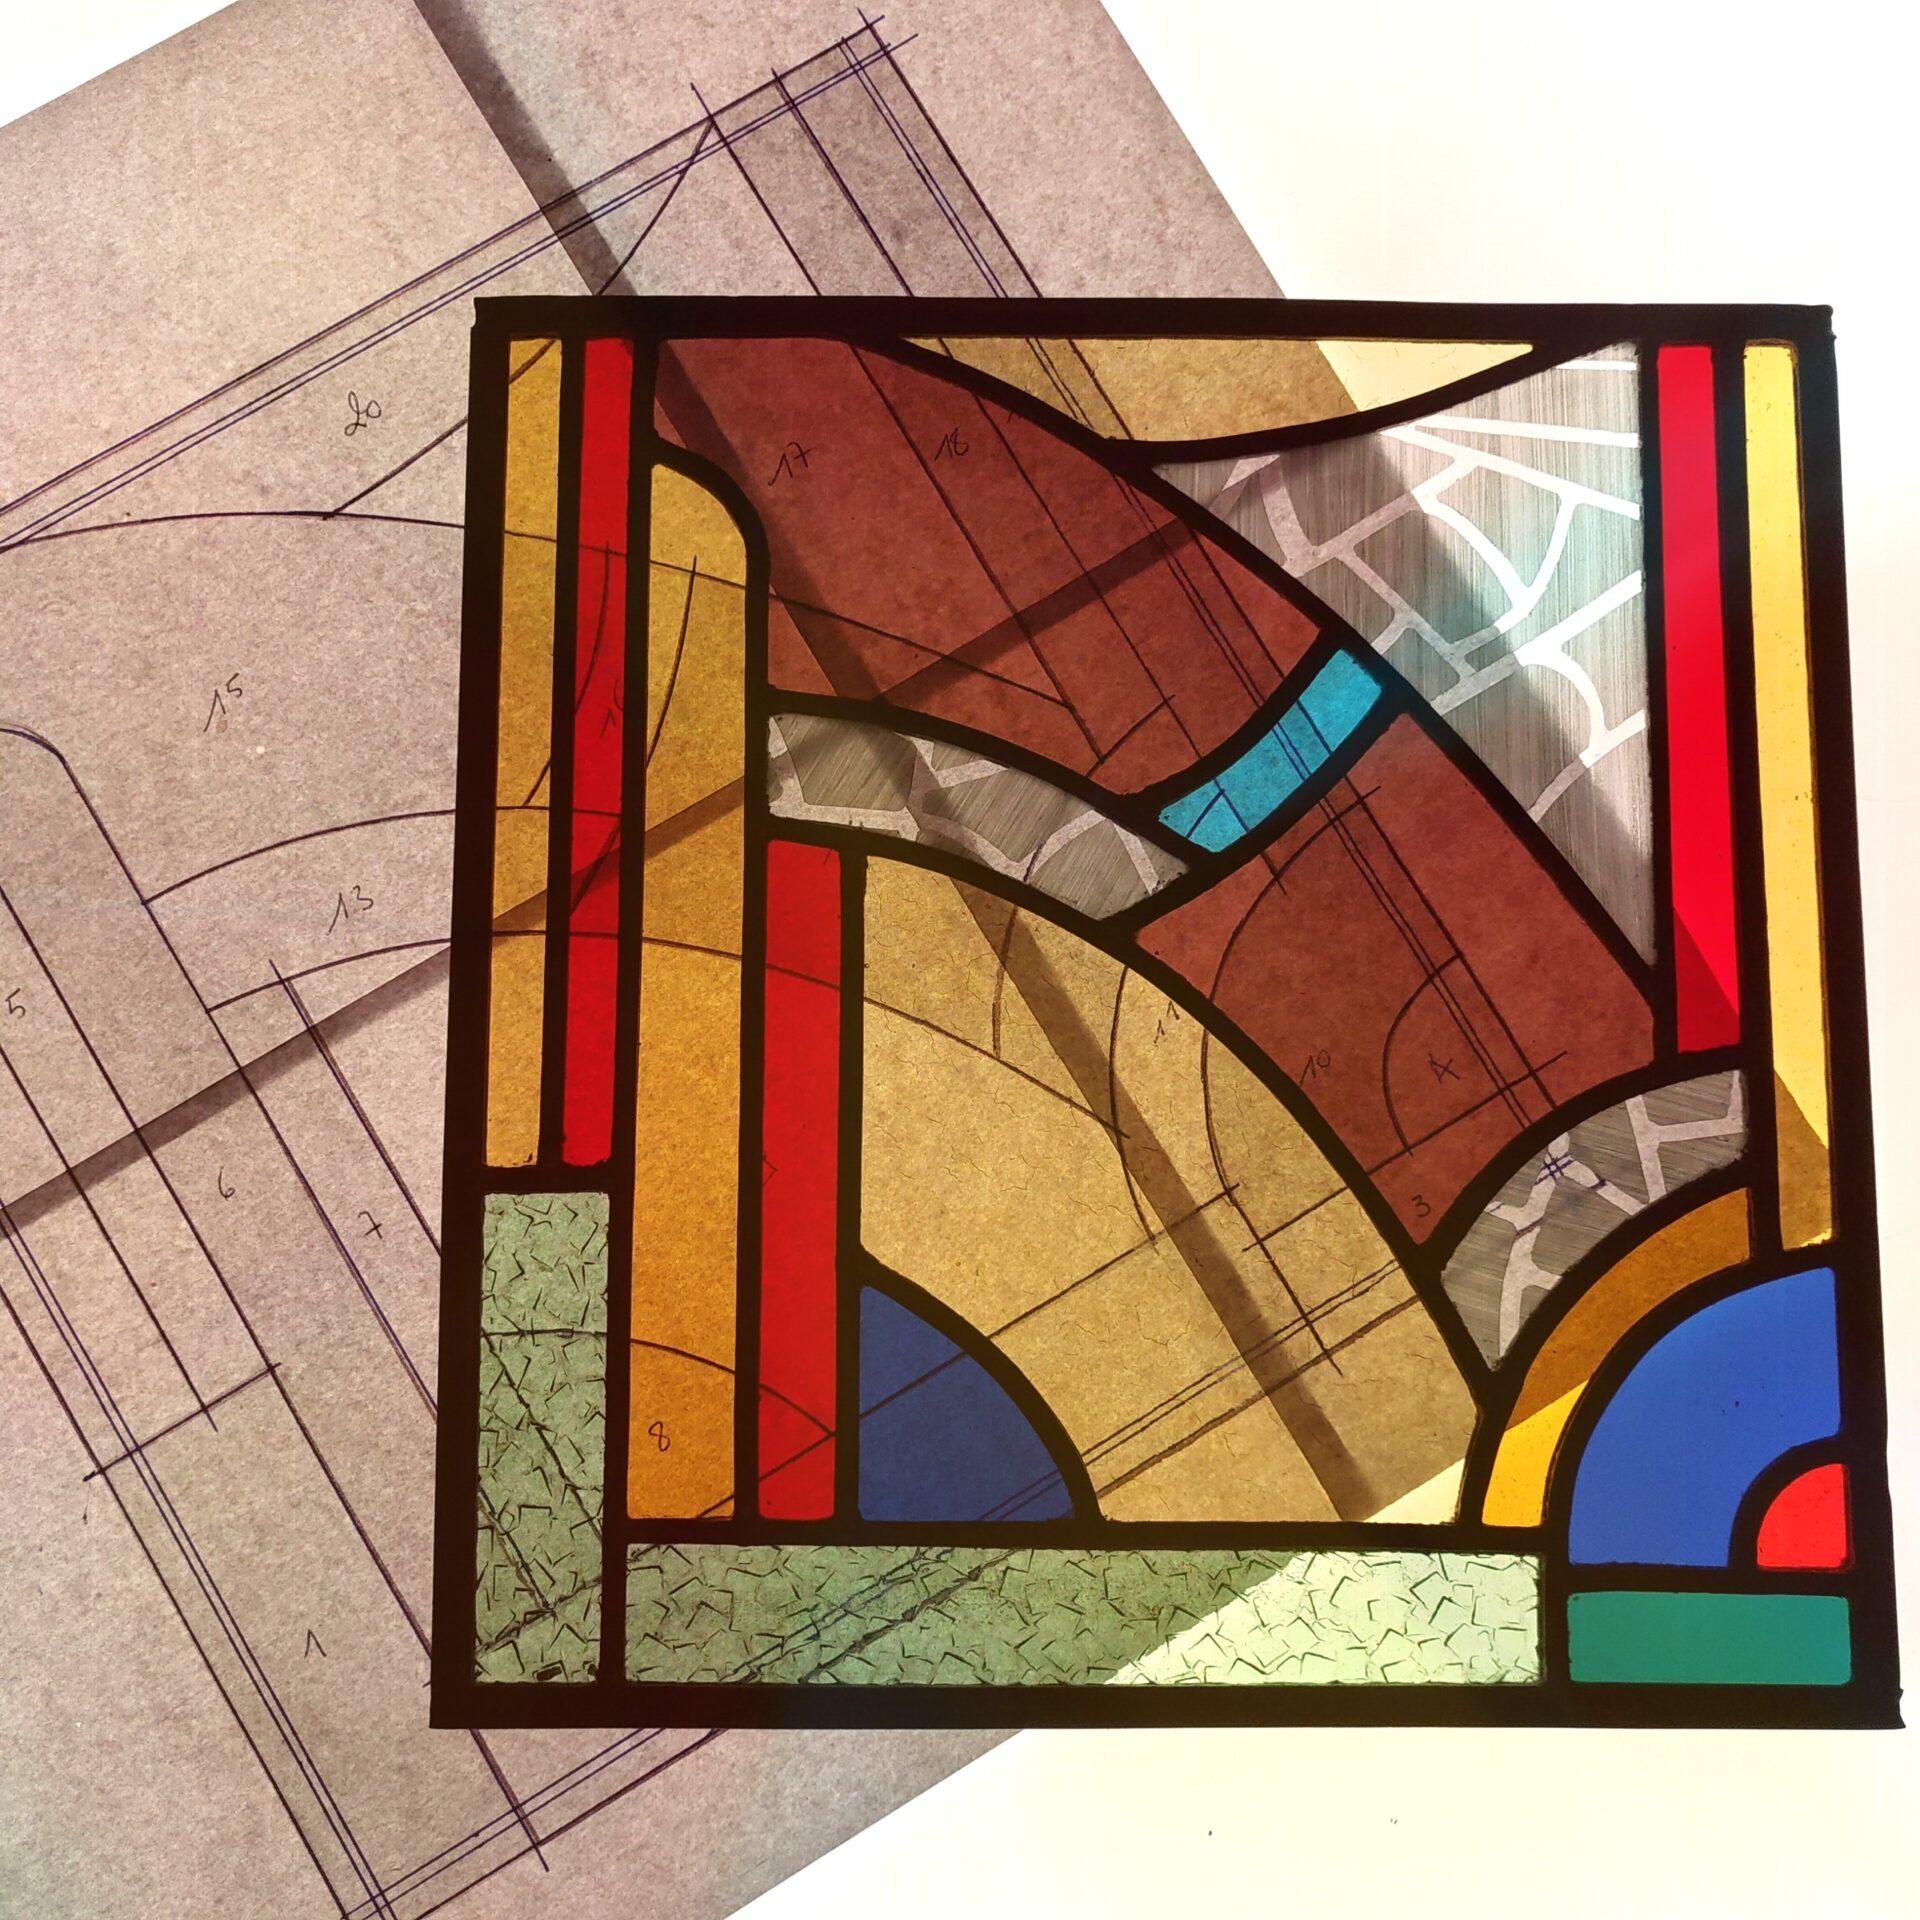 Illumen realisatie van Glas-in-lood Isabelle Decallonne